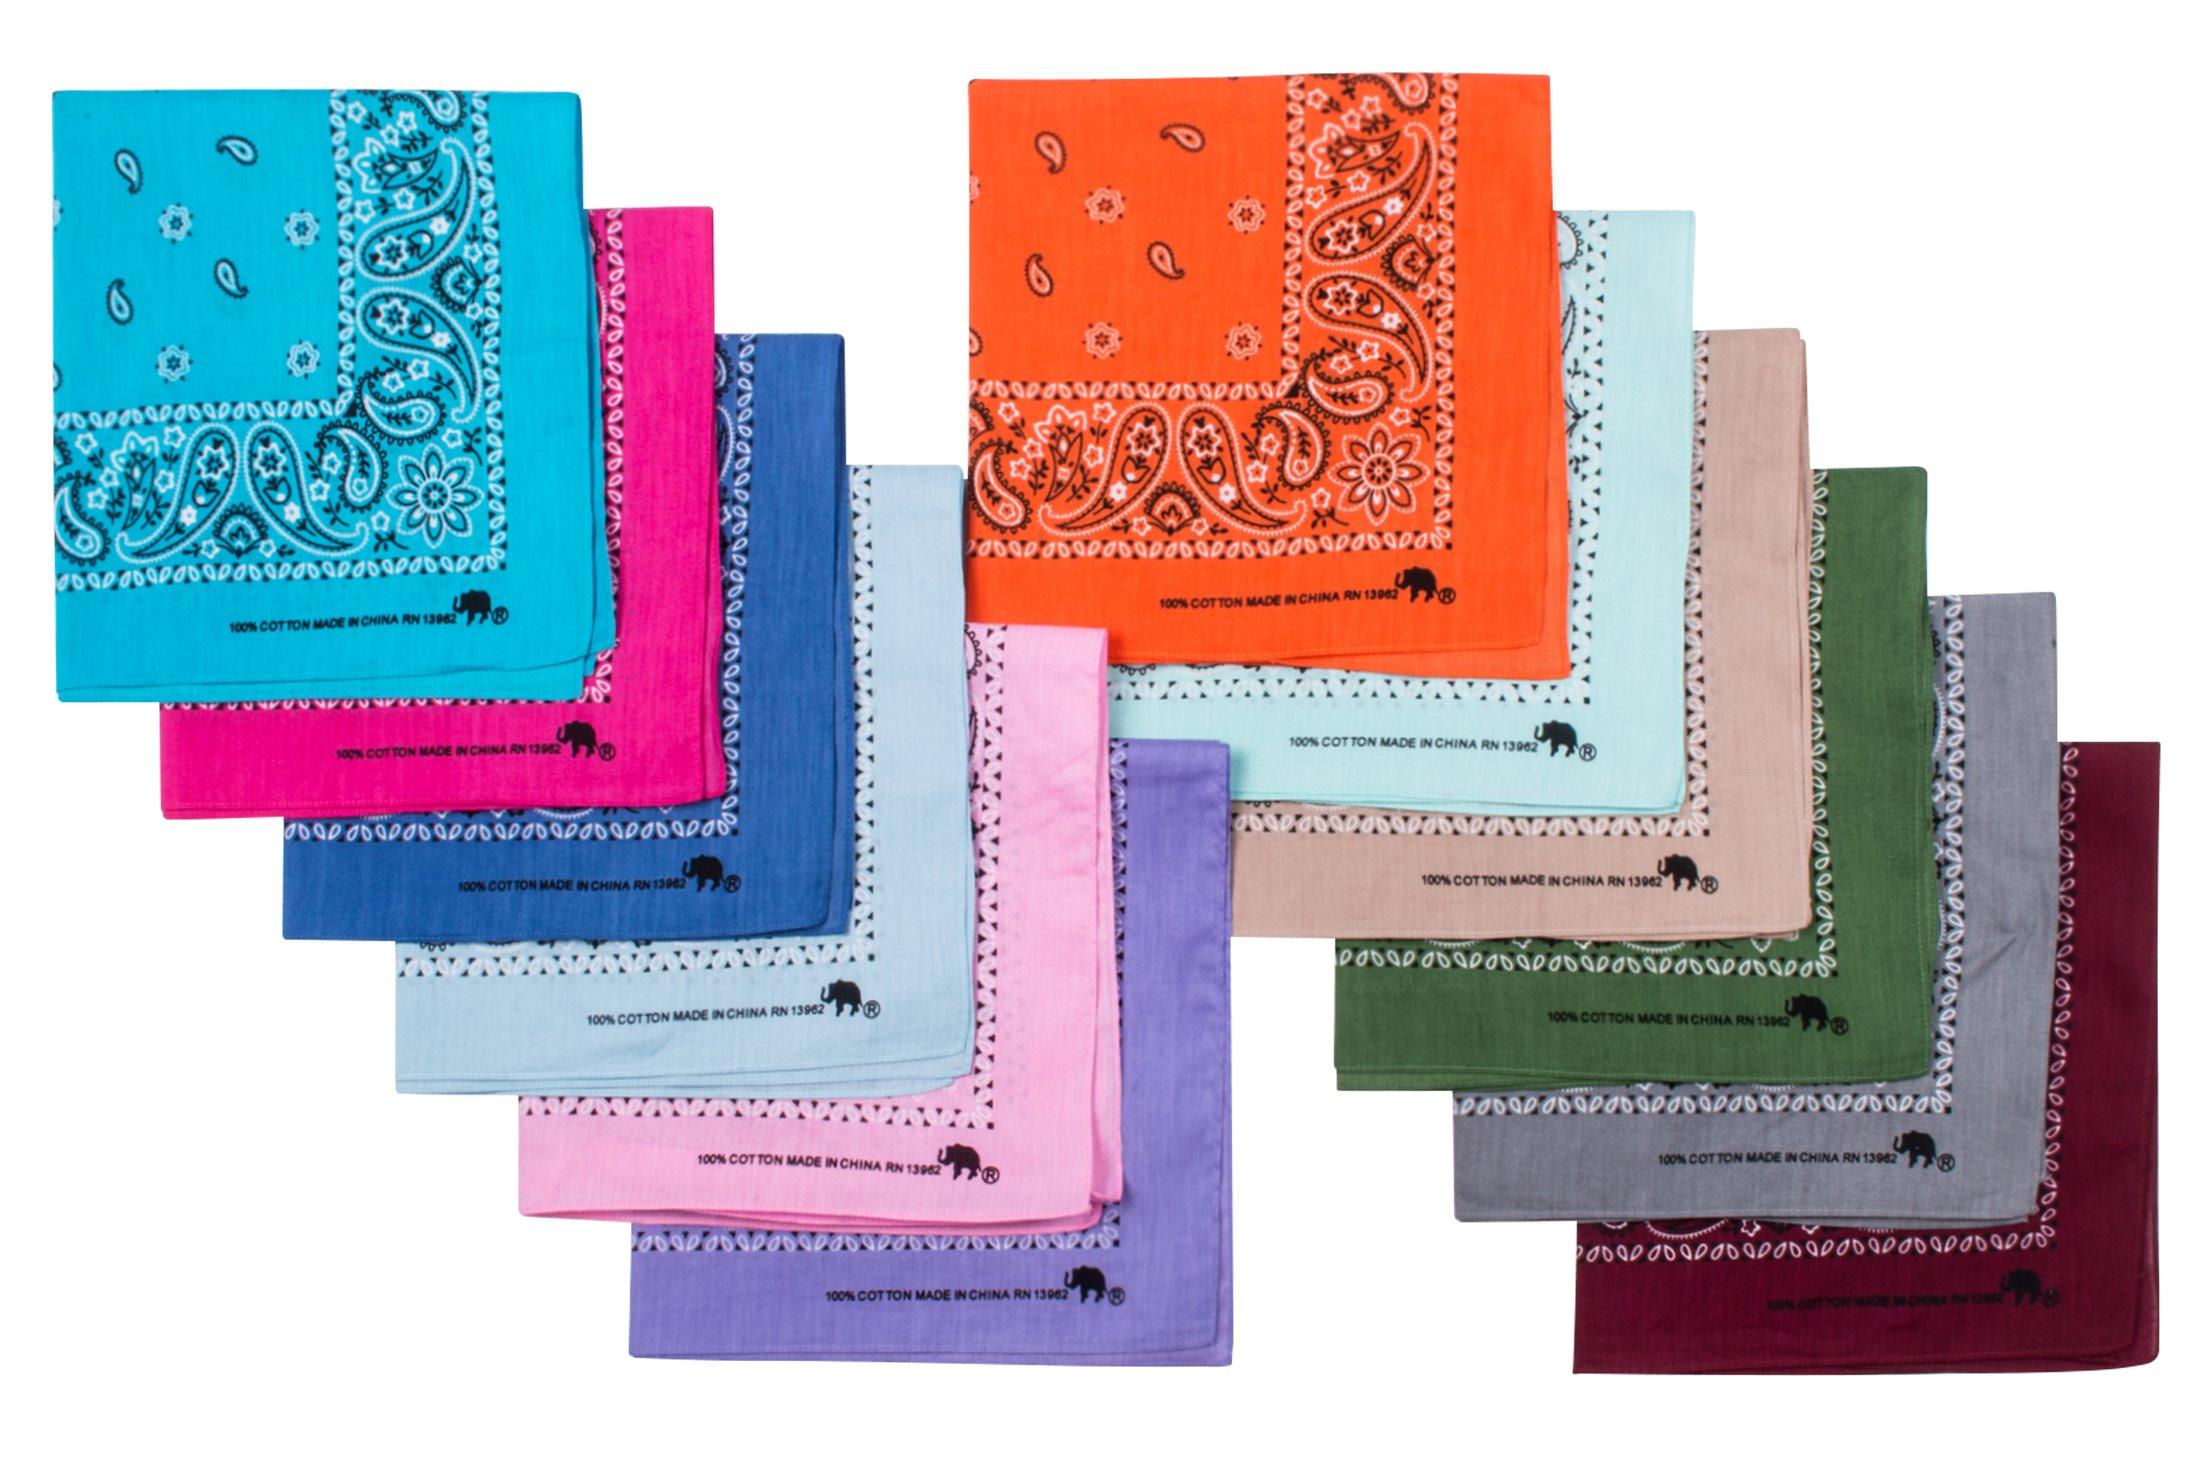 Elephant Brand Bandanas 100% cotton since 1898-12 Pack (Assorted Fashion)